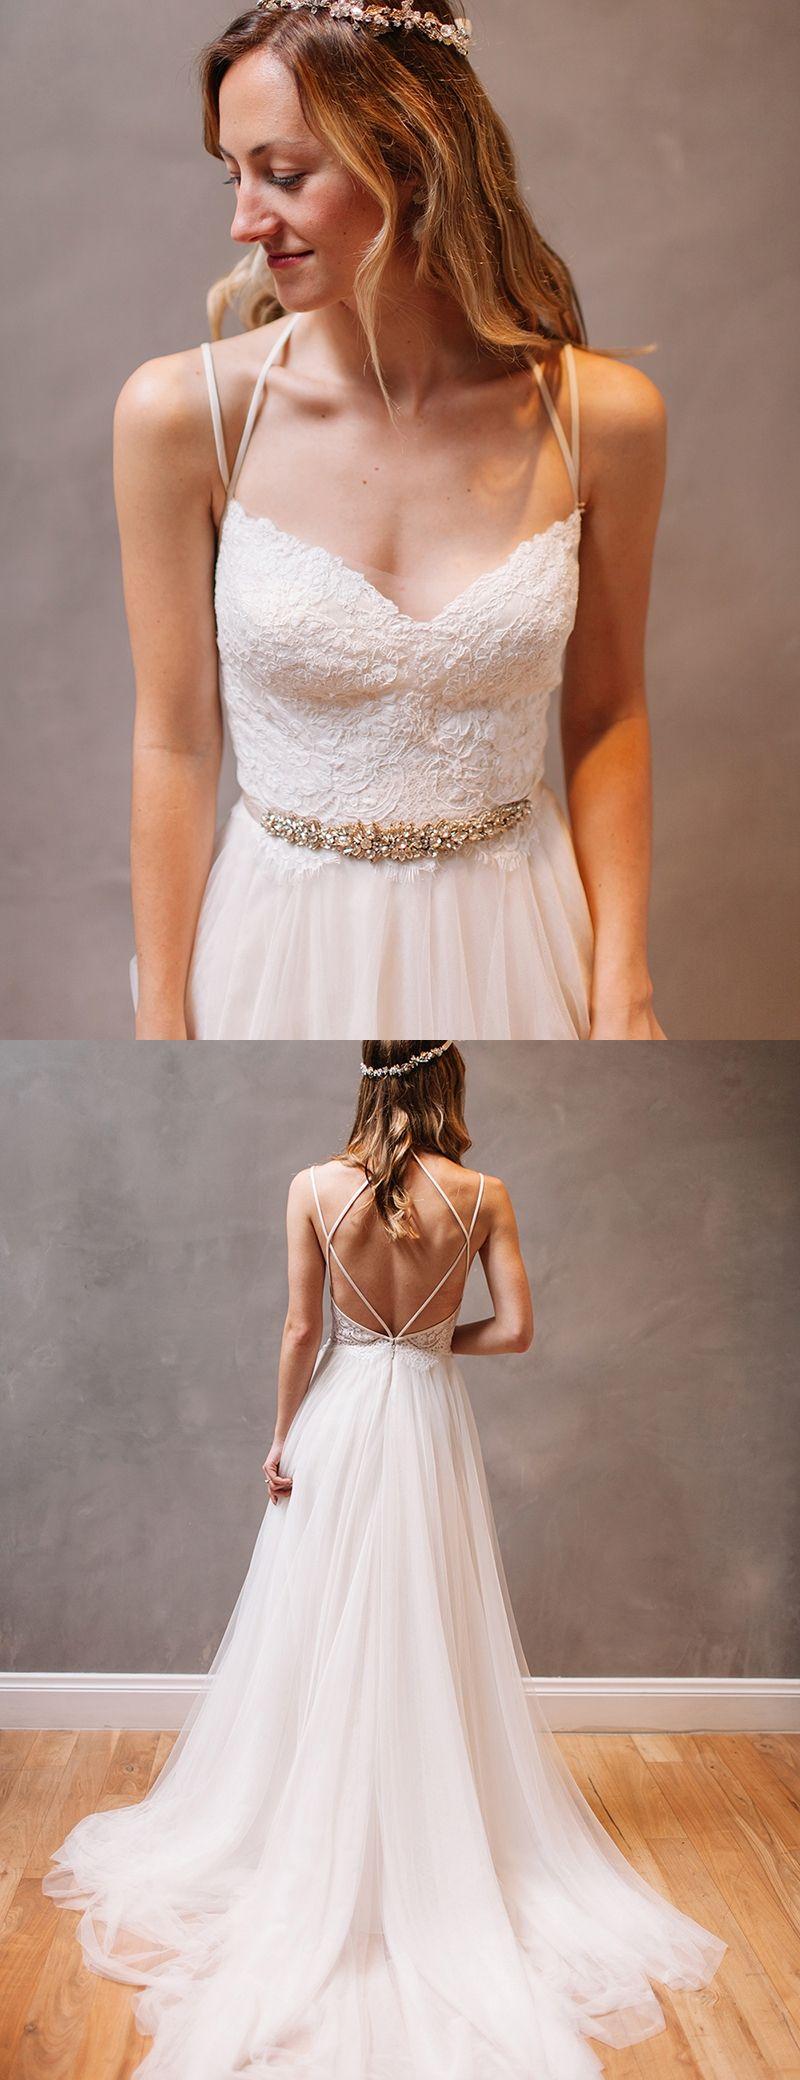 Stylish spaghetti straps sexy wedding dresses court train form